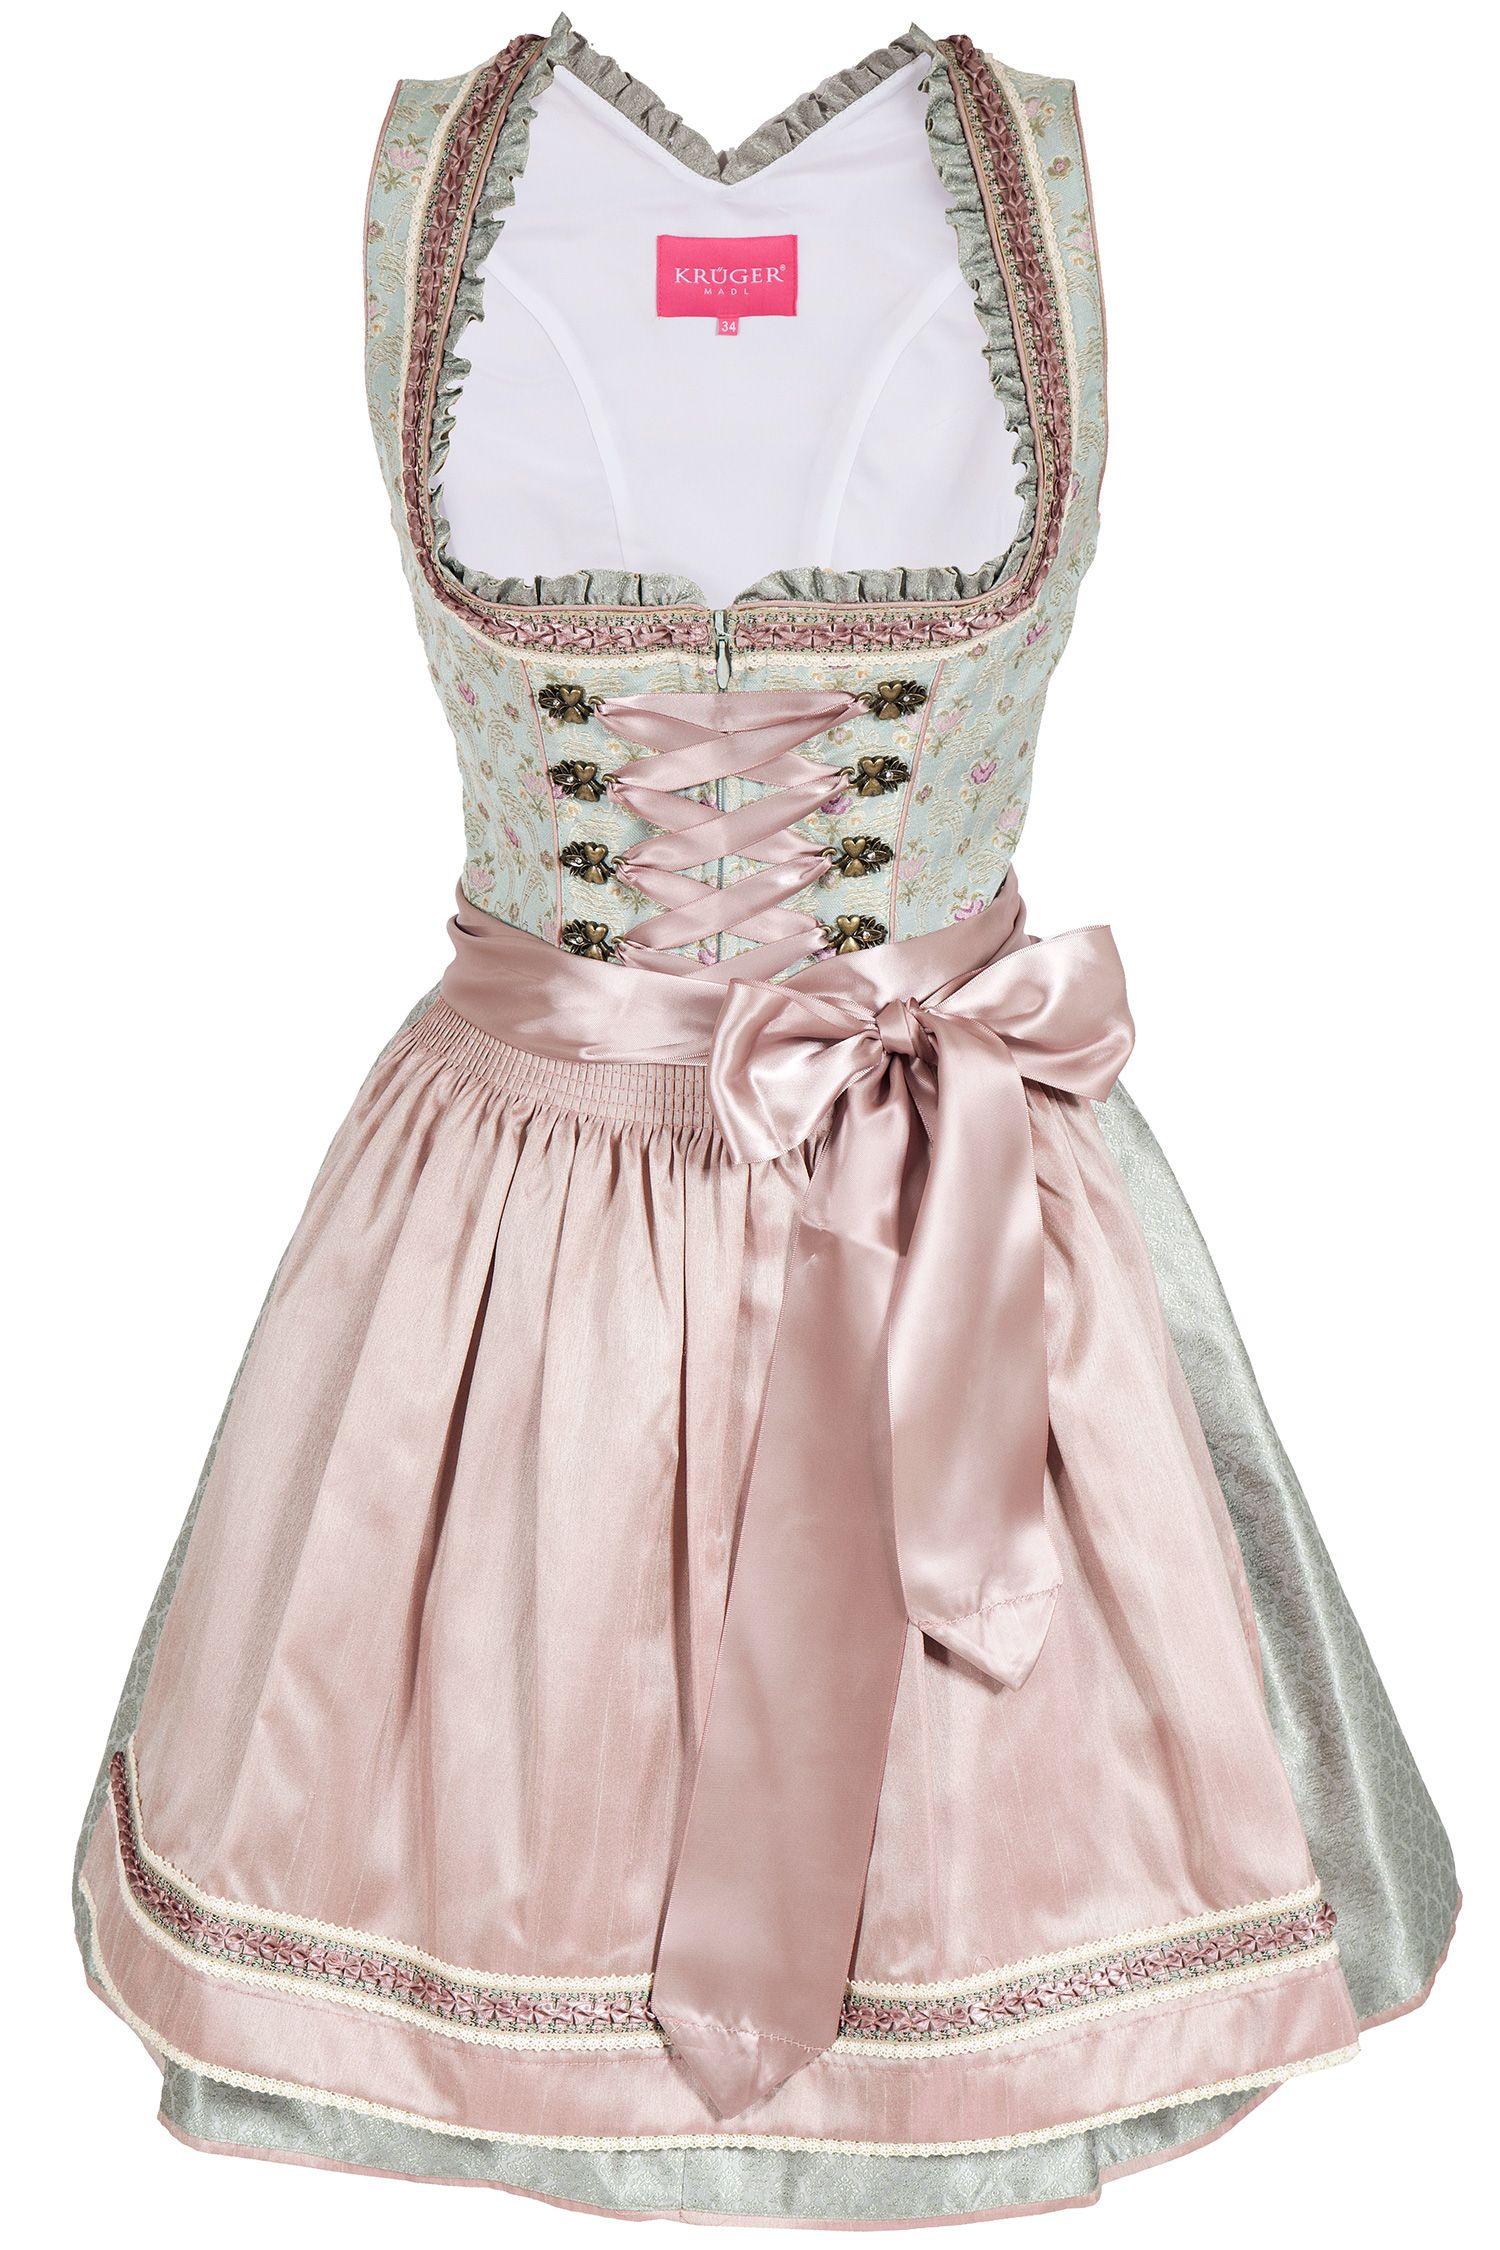 Mini Dirndl In Mint Und Altrosa Im Vintage Stil 50 Cm Dirndl Kurze Dirndl Outfit